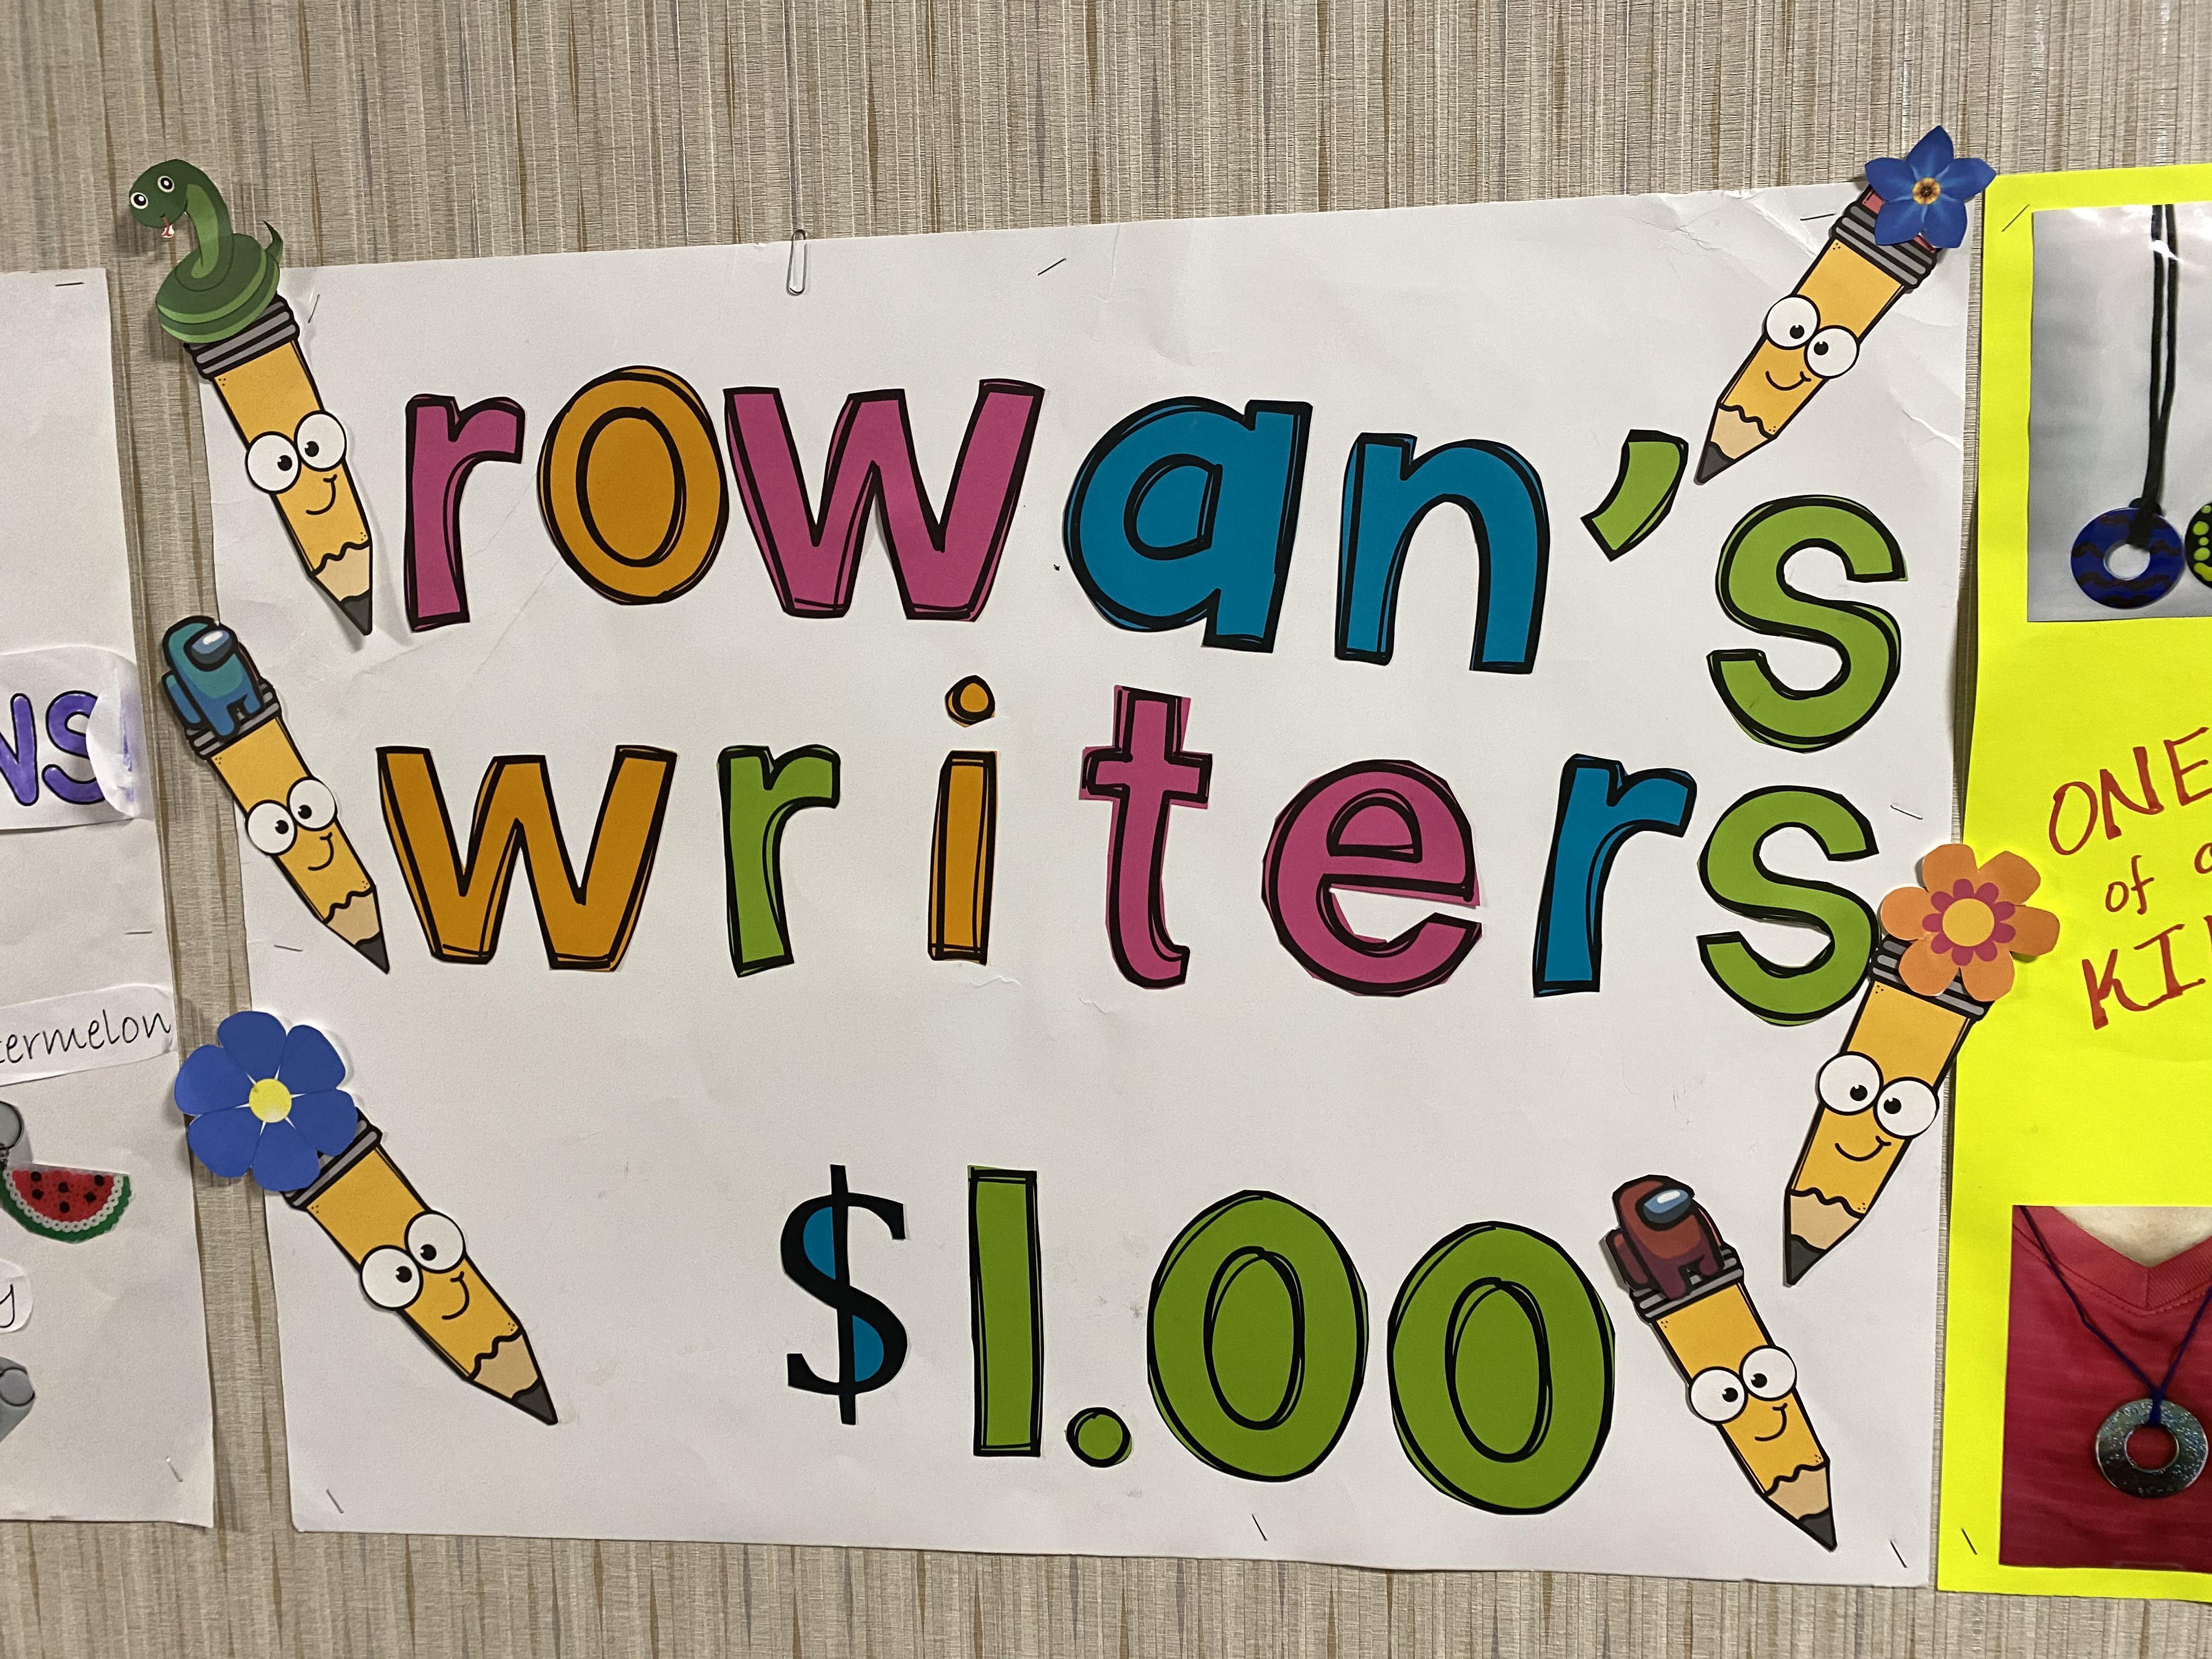 Rowan's writers